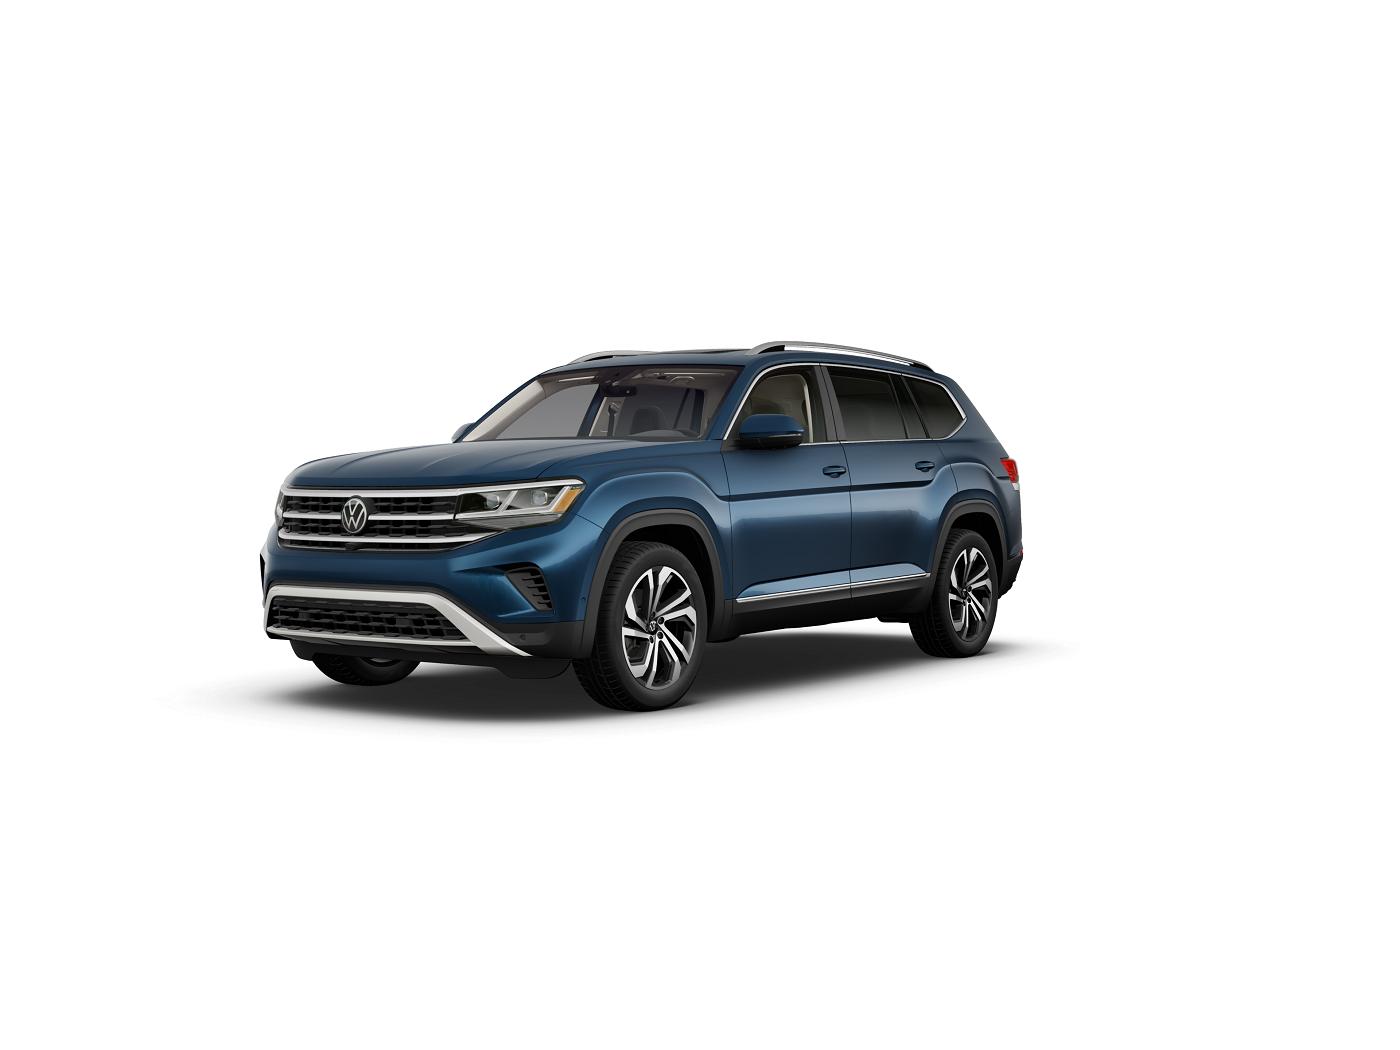 2021 VW Atlas Trim Levels Littleton CO | McDonald VW